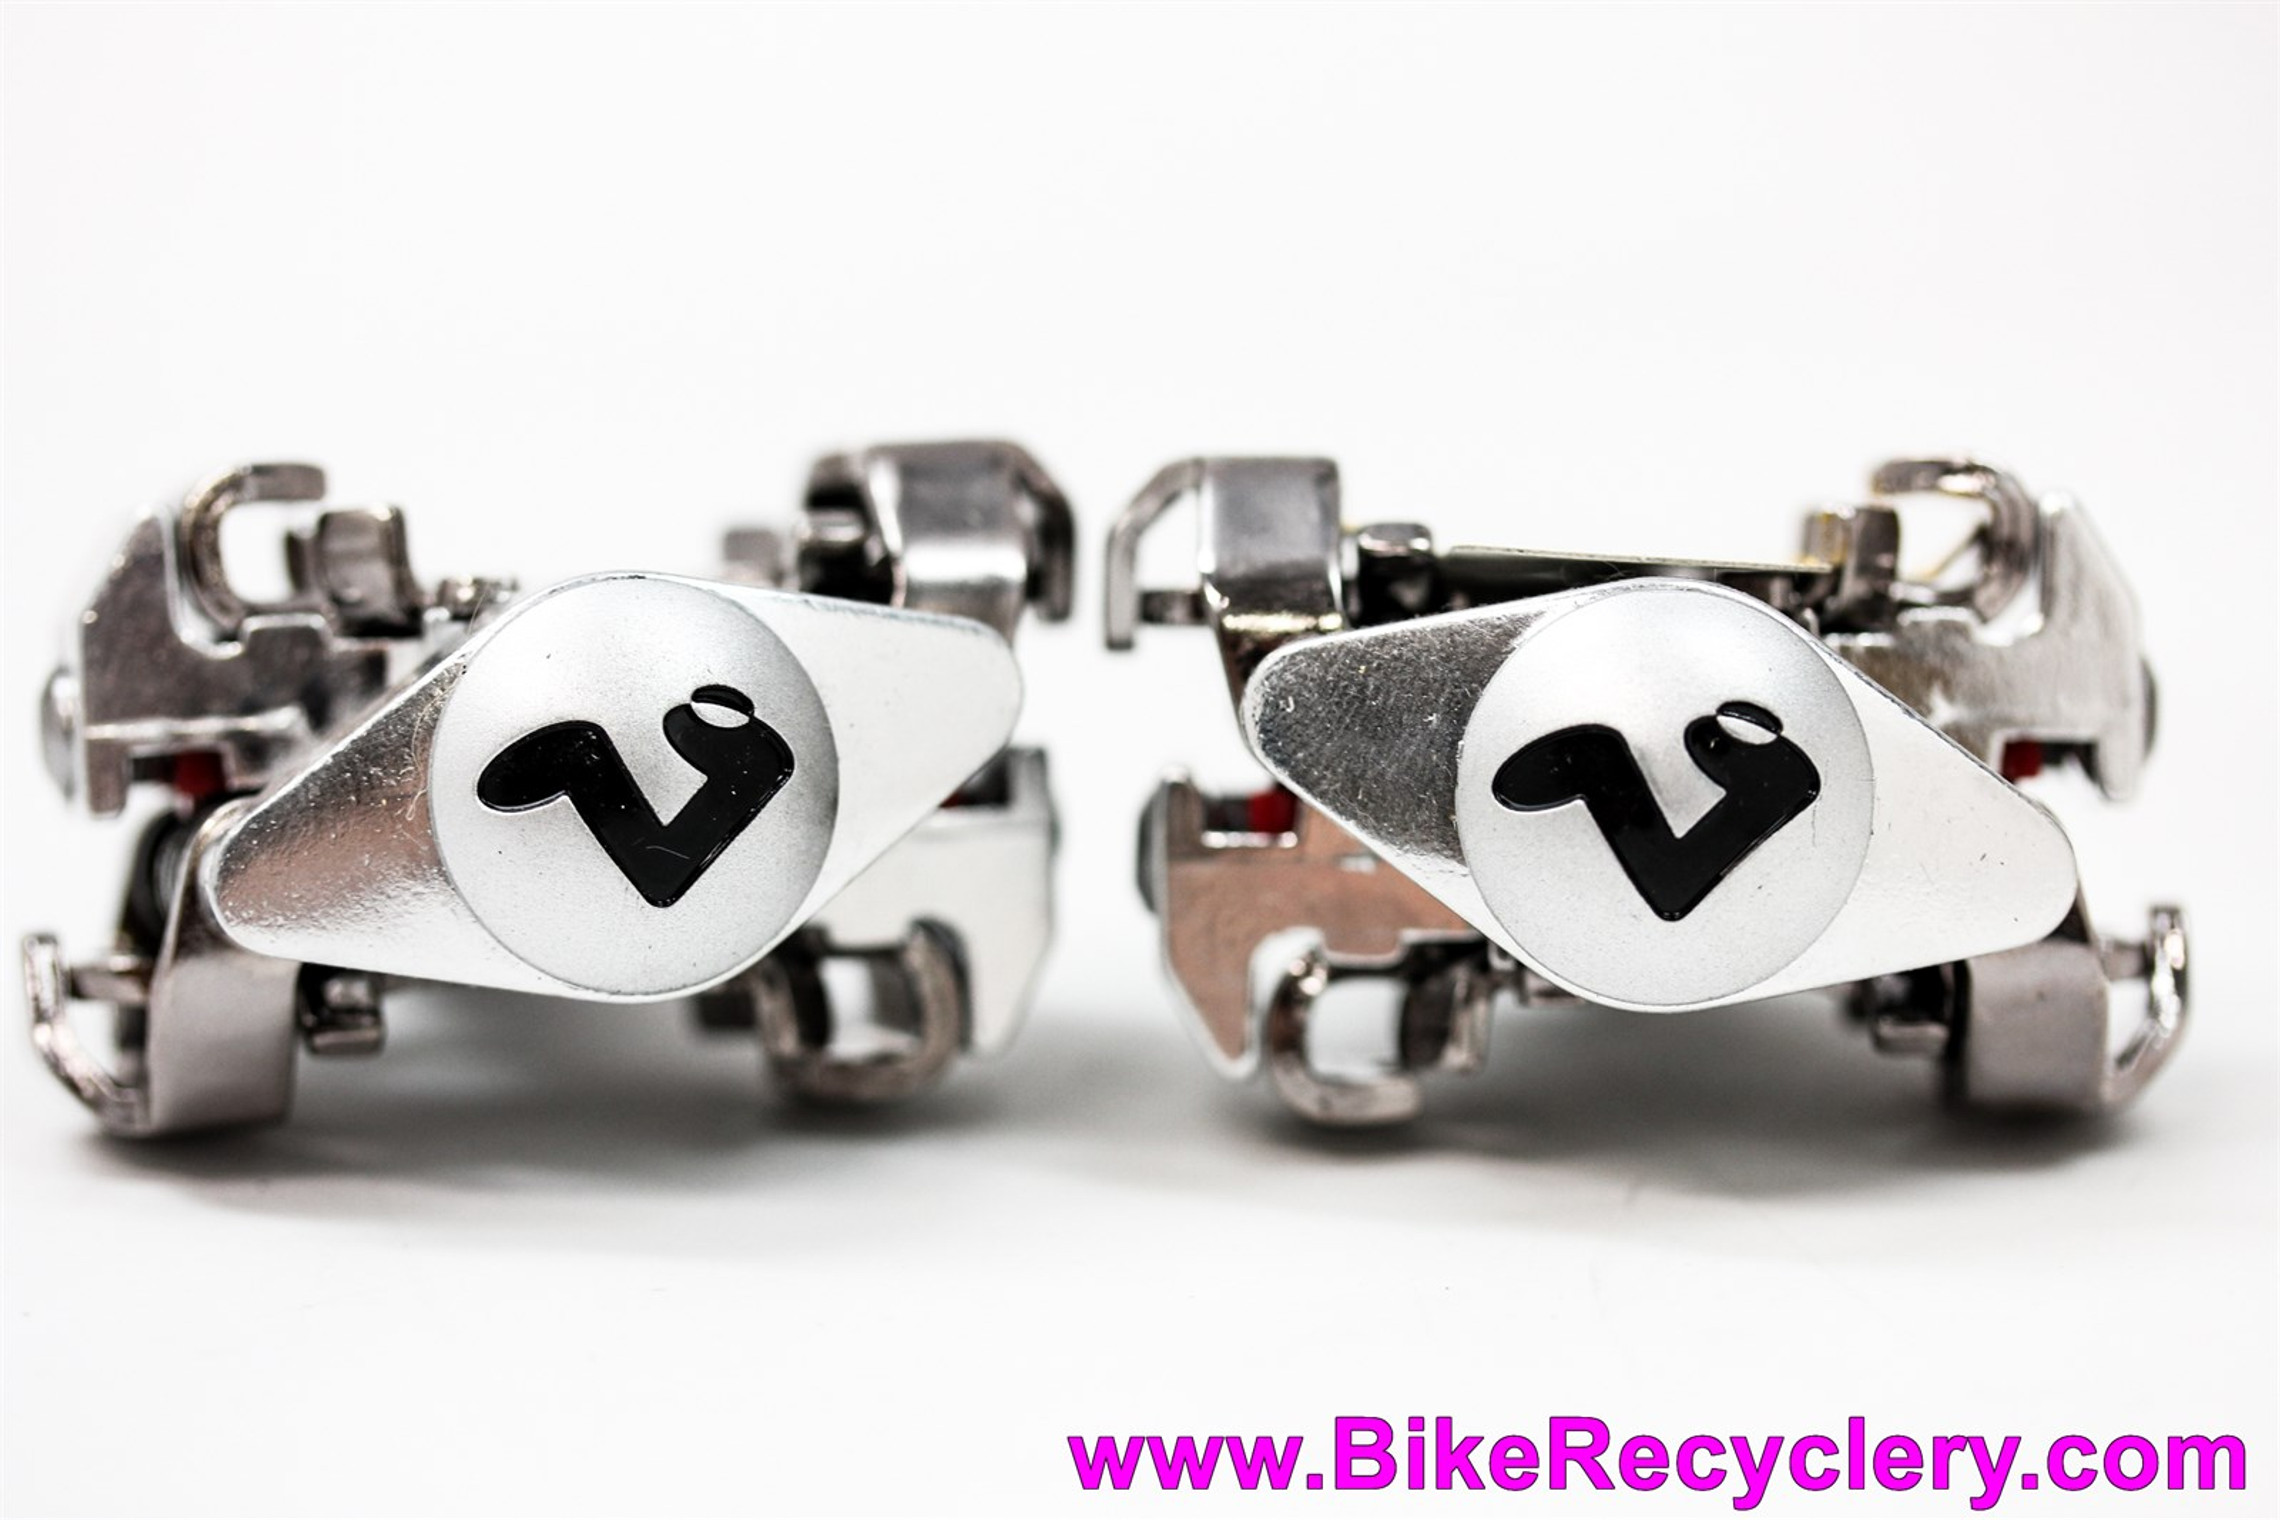 NIB/NOS Shimano PD-M515 Mountain Bike SPD Pedals: Vintage 1990's - Silver